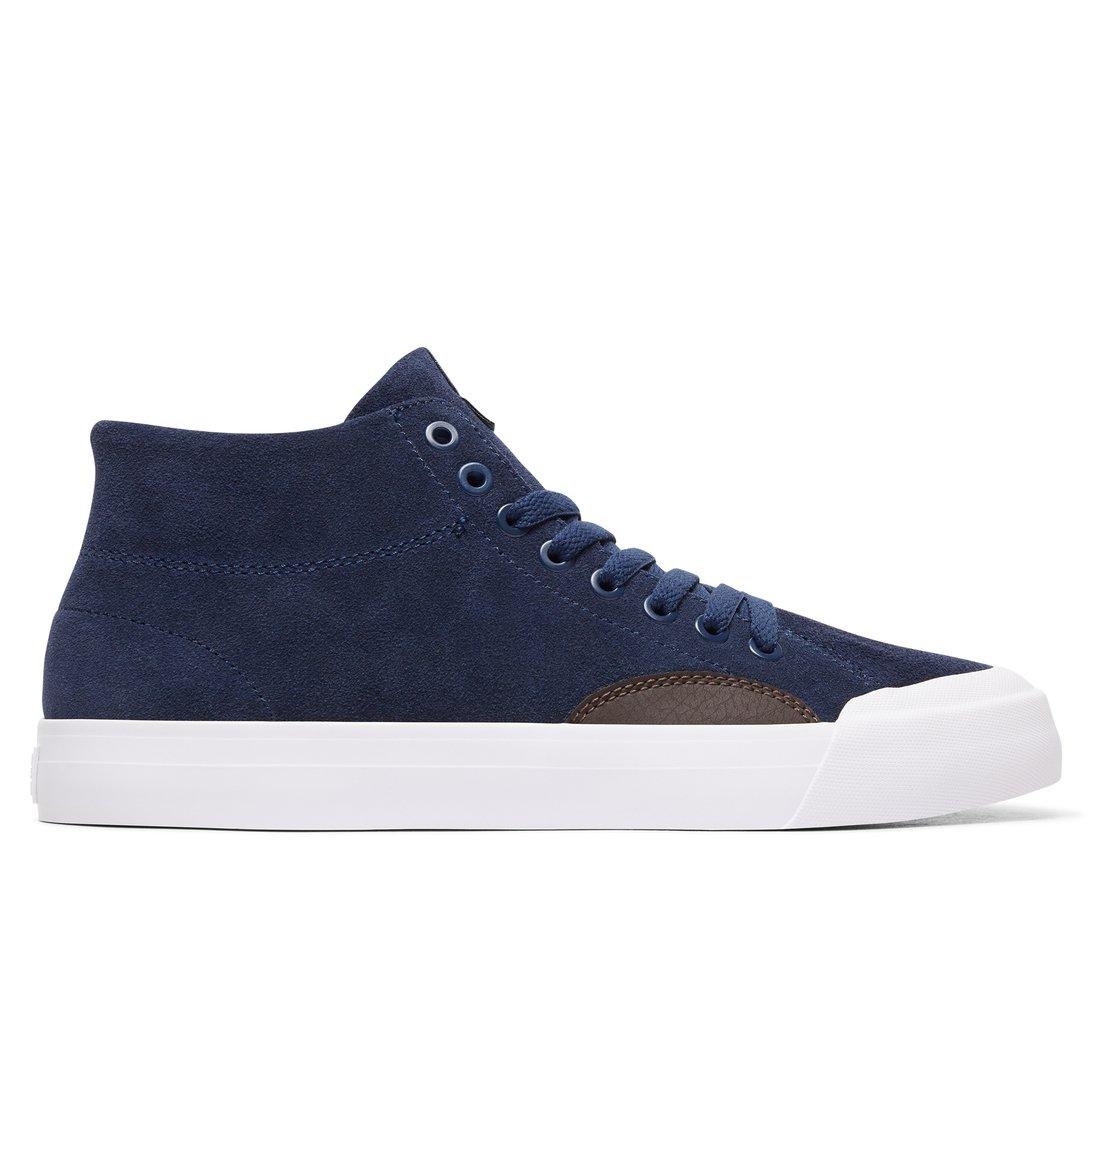 87b9c8ea6b 0 Evan Smith Hi Zero S - High-Top Skate Shoes for Men Blue ADYS300477